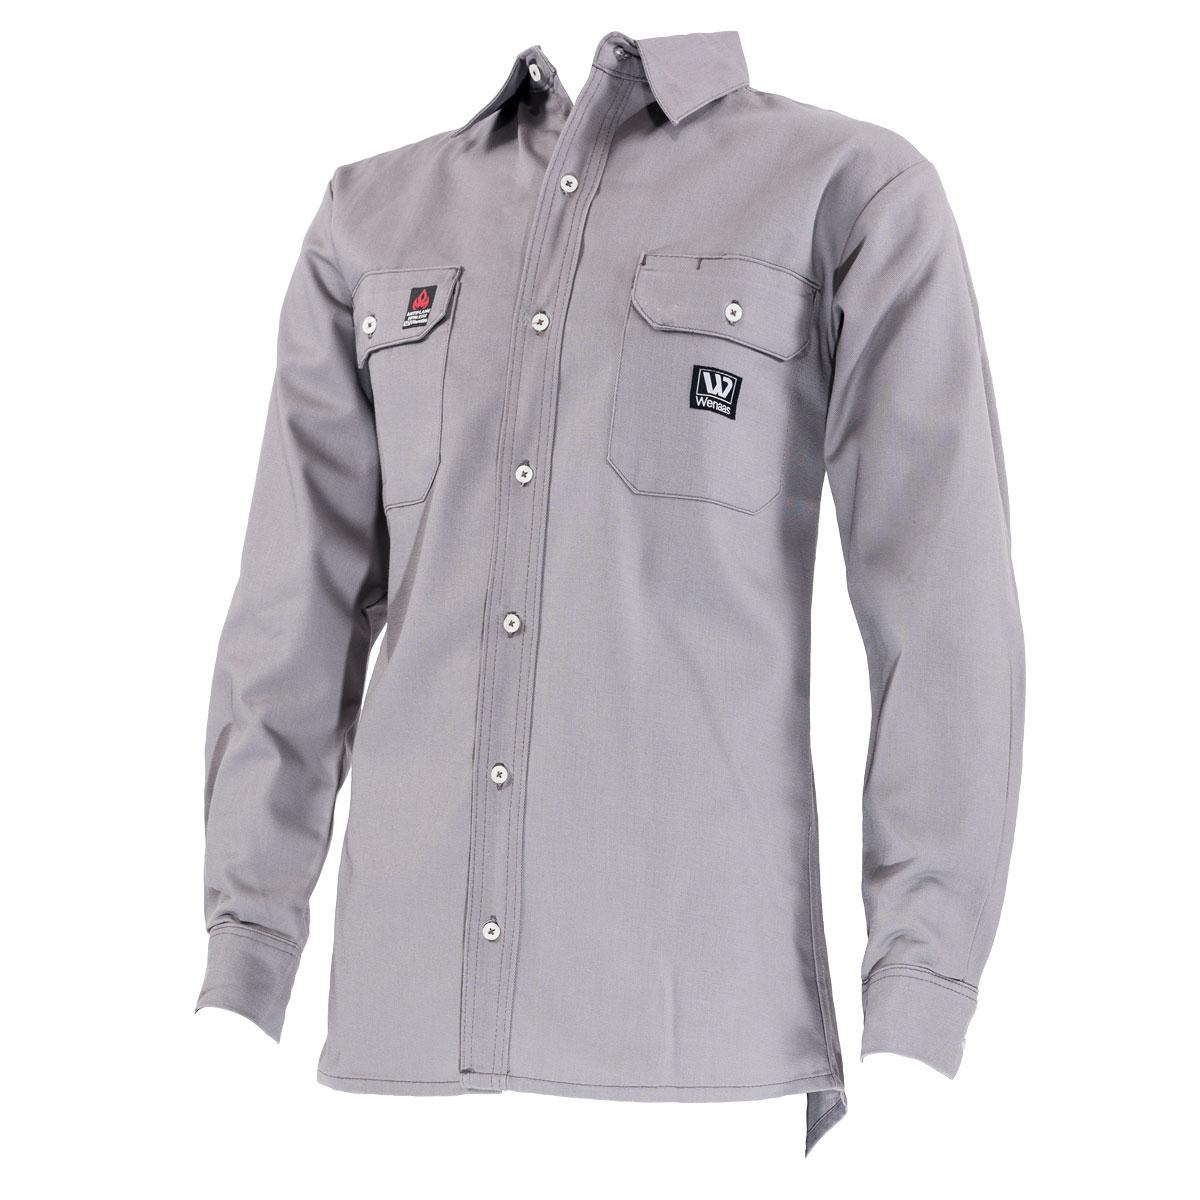 Men s flame retardant shirt for Flame resistant work shirts